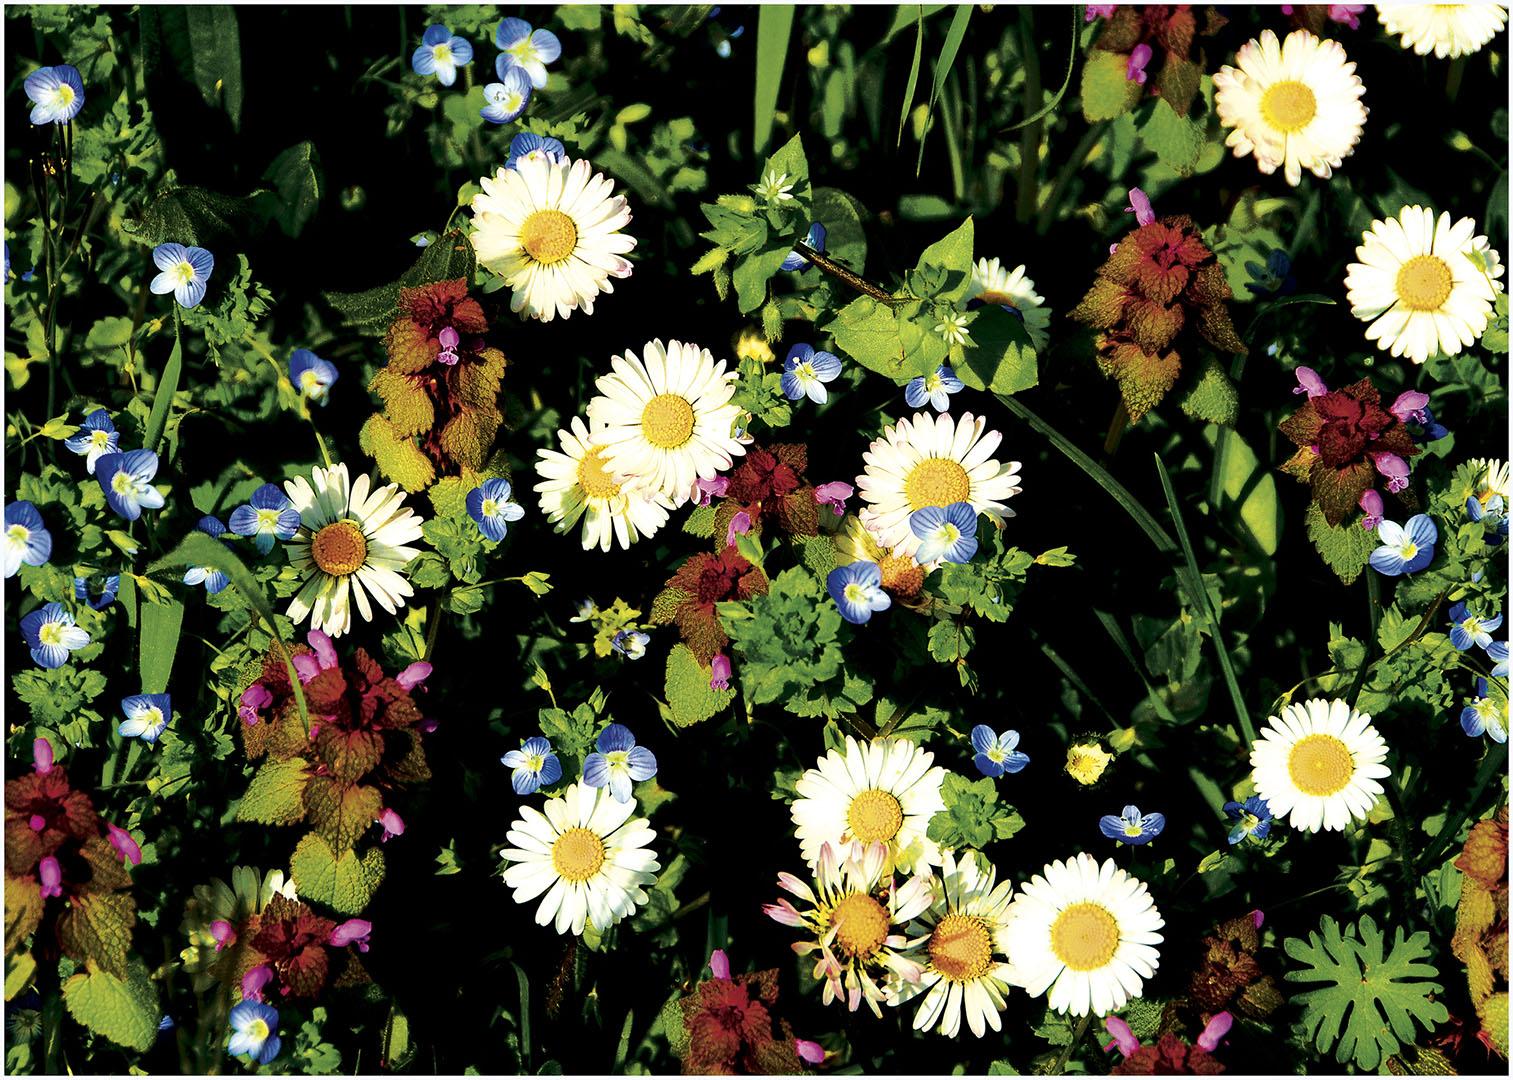 Flowers_146_I12.1-66